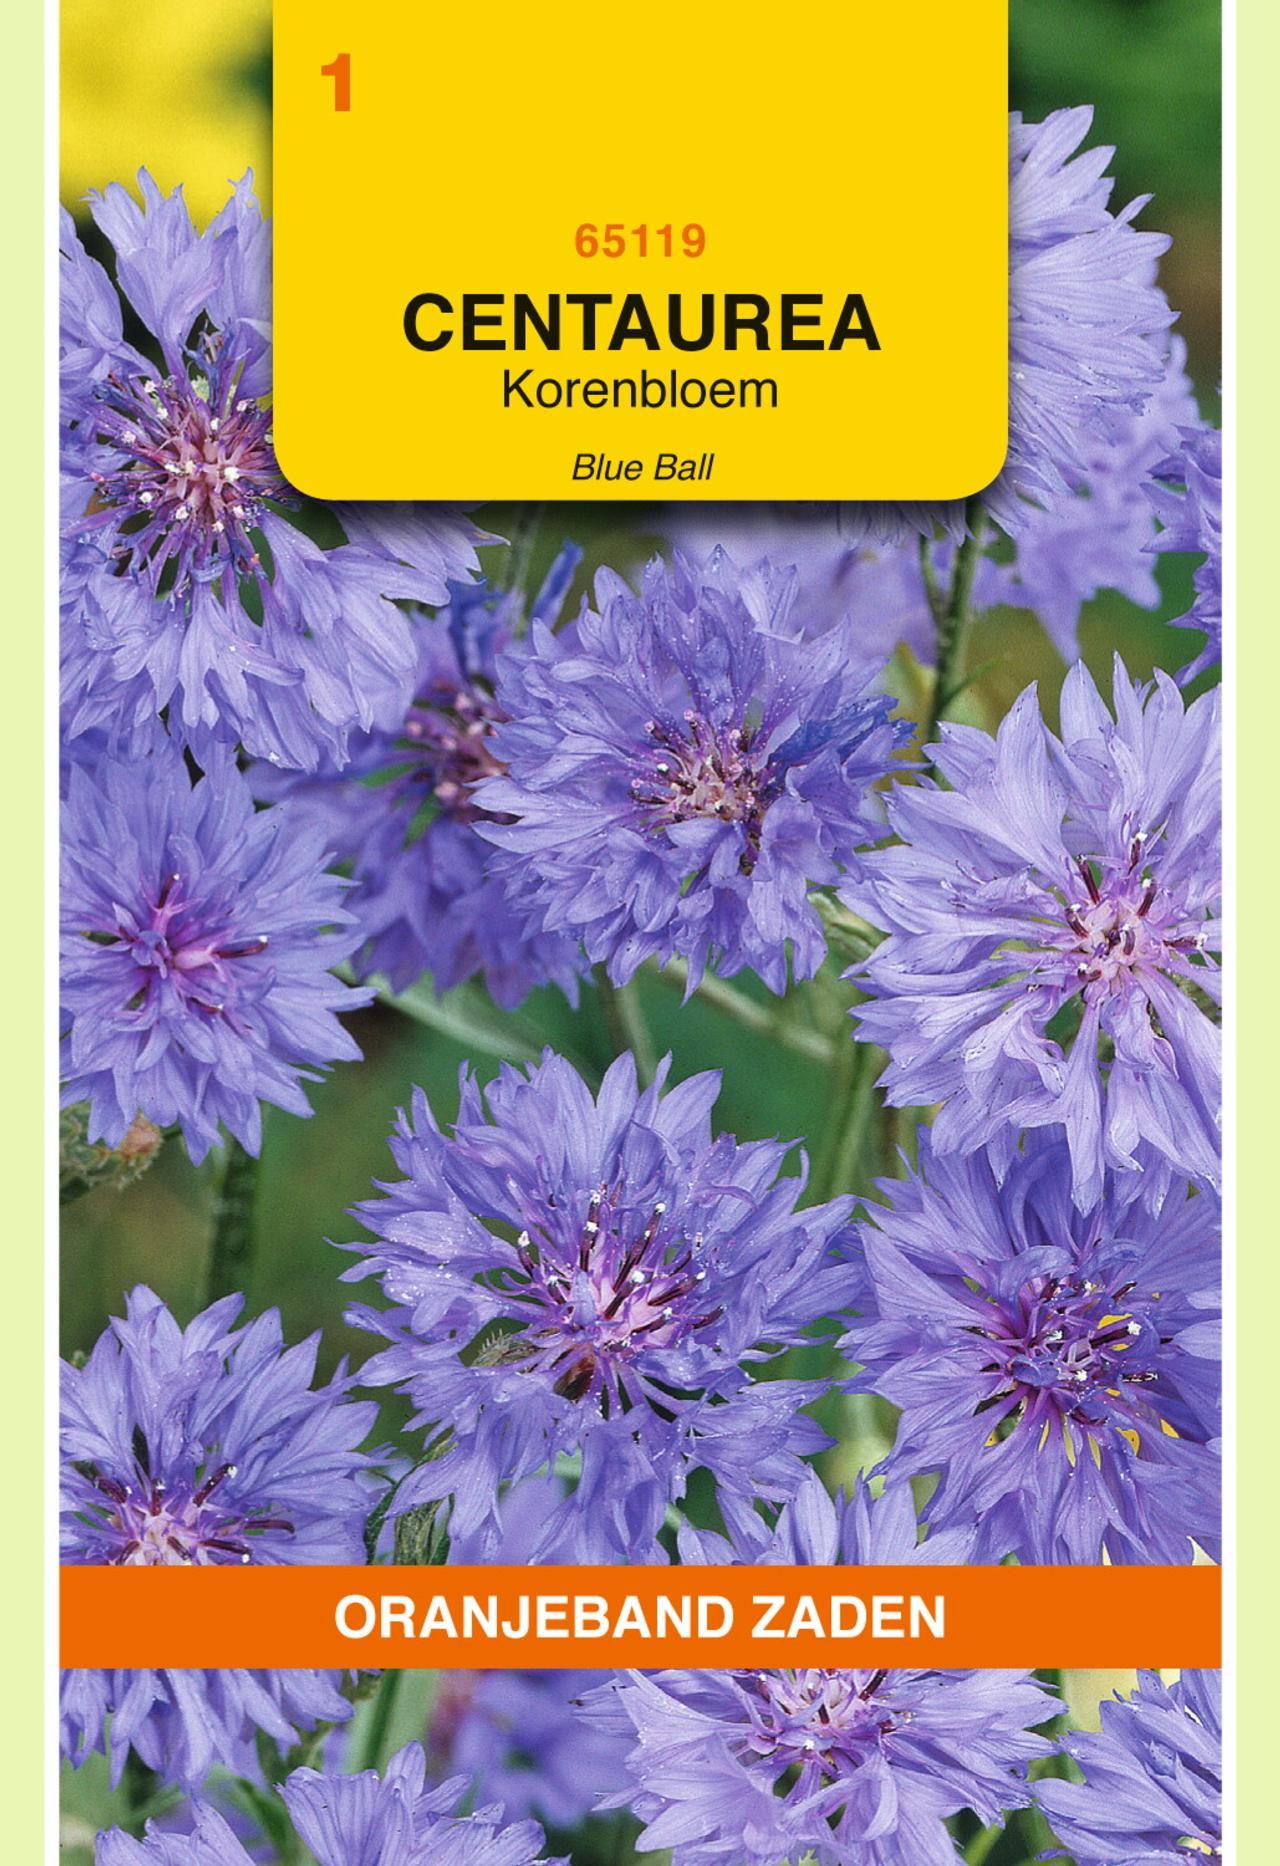 Centaurea cyanus 'Blue Ball' plant